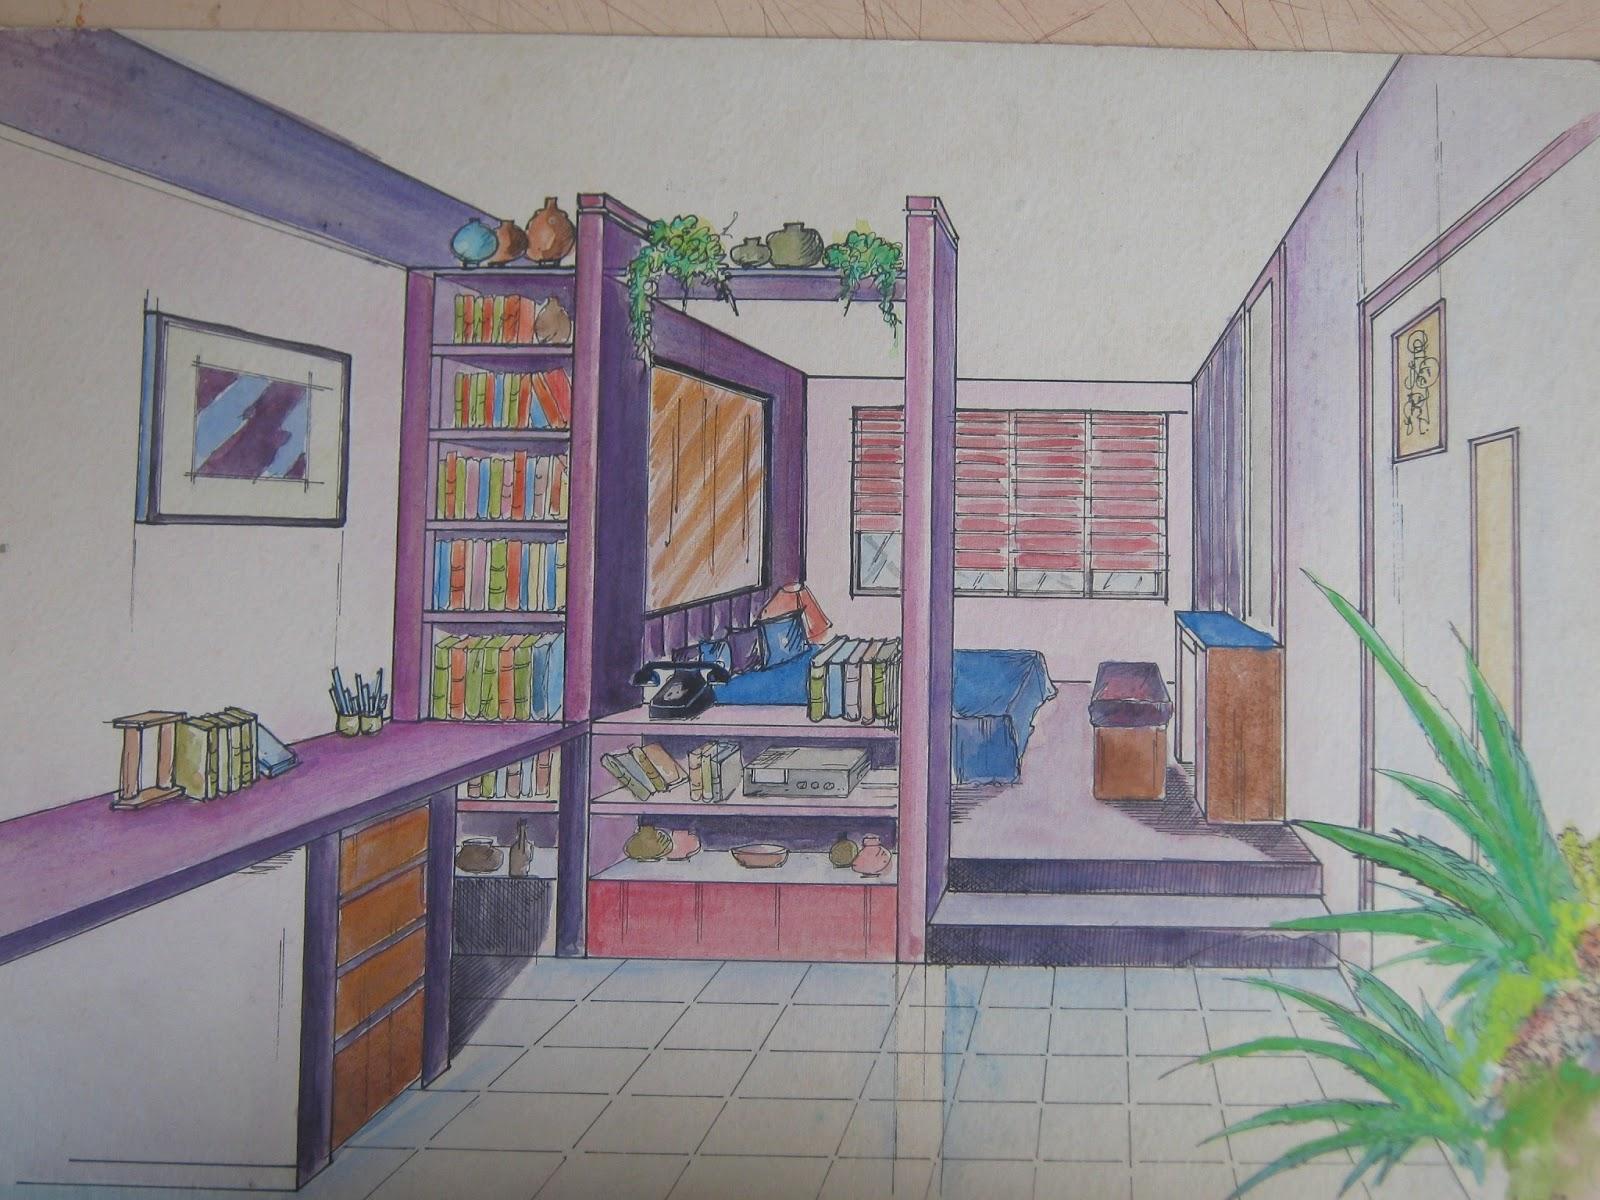 Ajit art and designs : INTERIOR VIEWS ............... THE ...